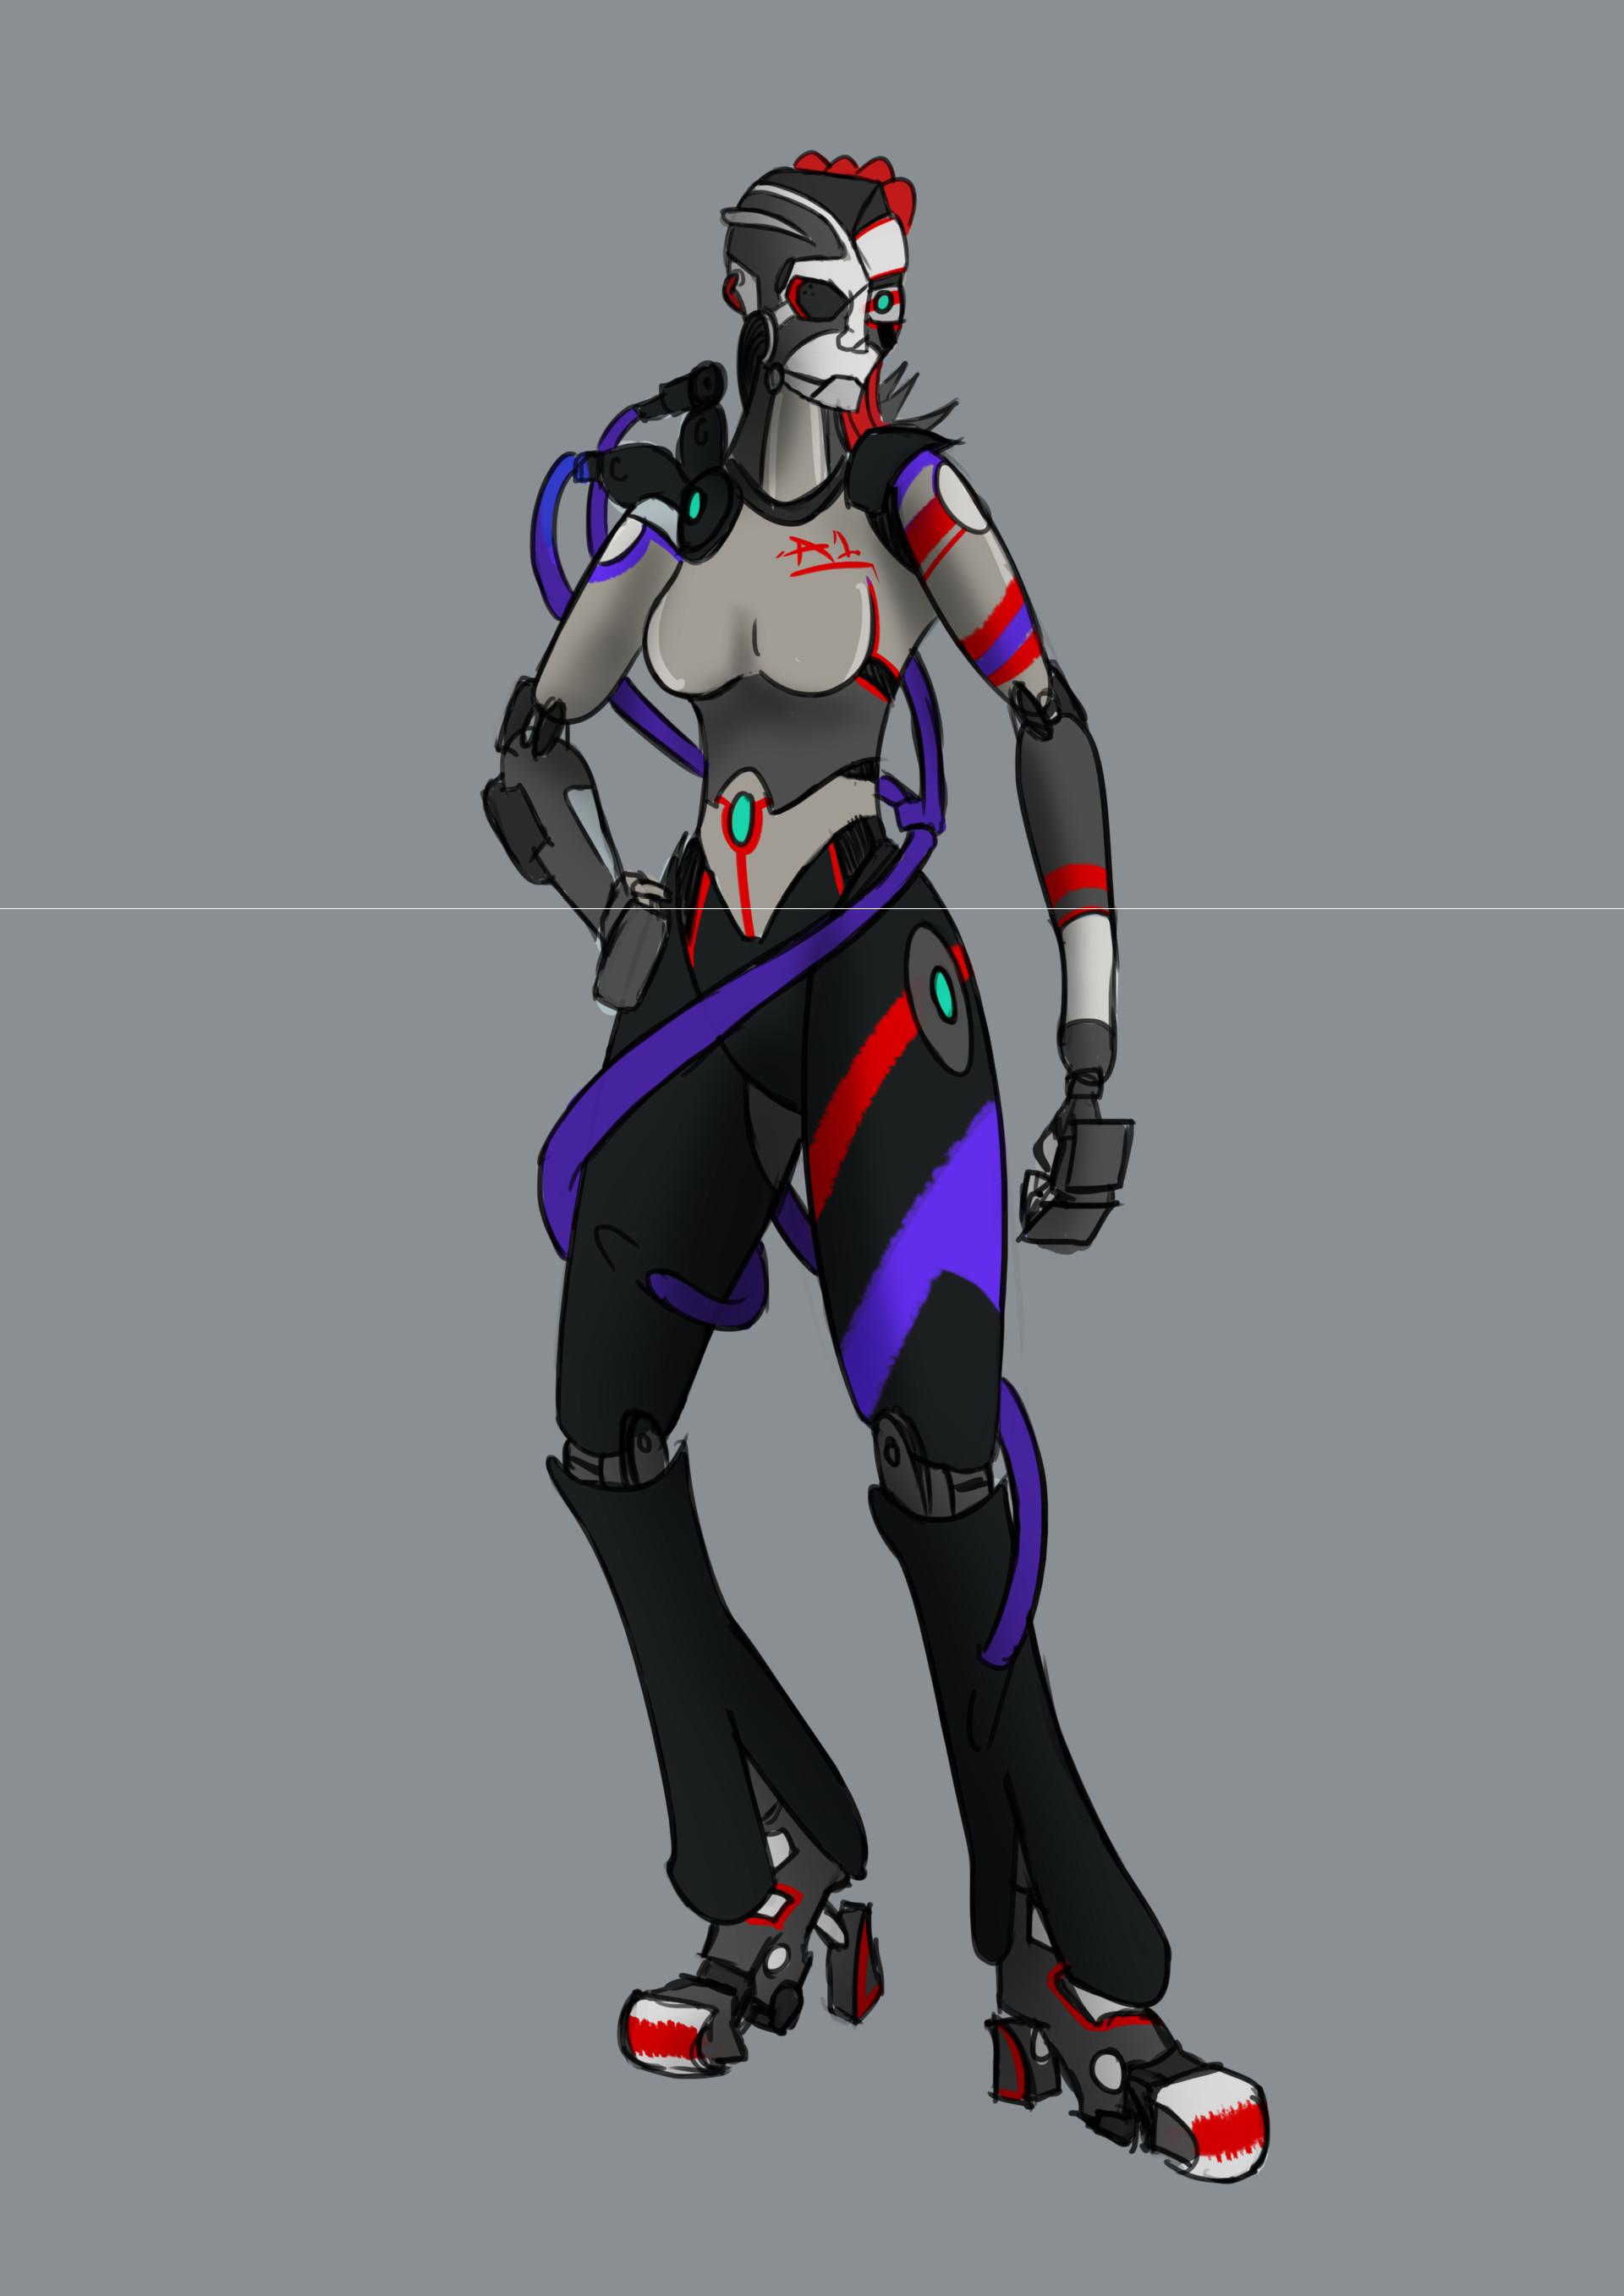 Morris Beck - Cyberpunk Android Design Concept